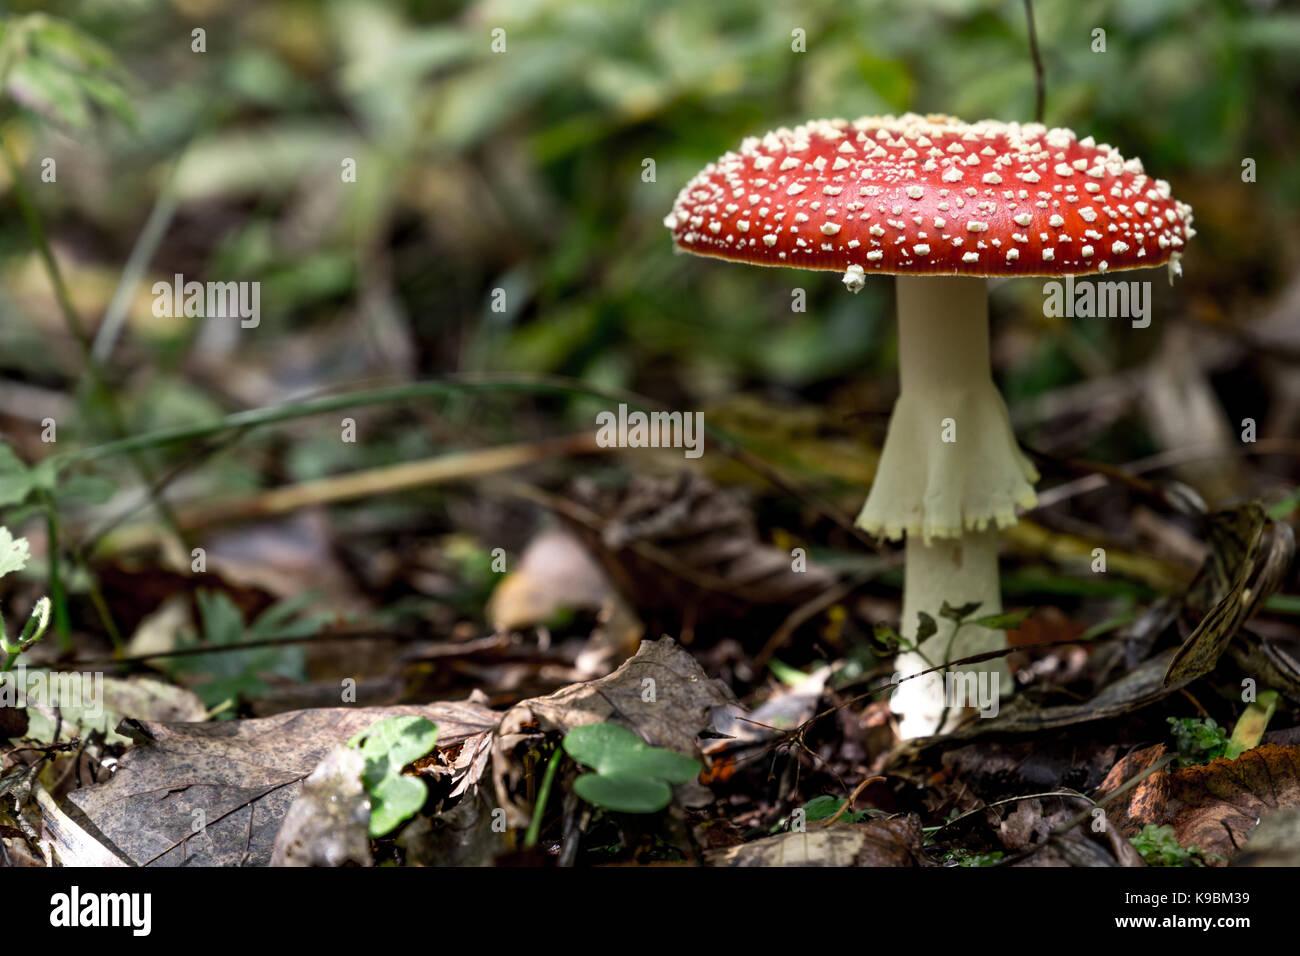 Mushroom Amanita Muscaria close up in landscape - Stock Image